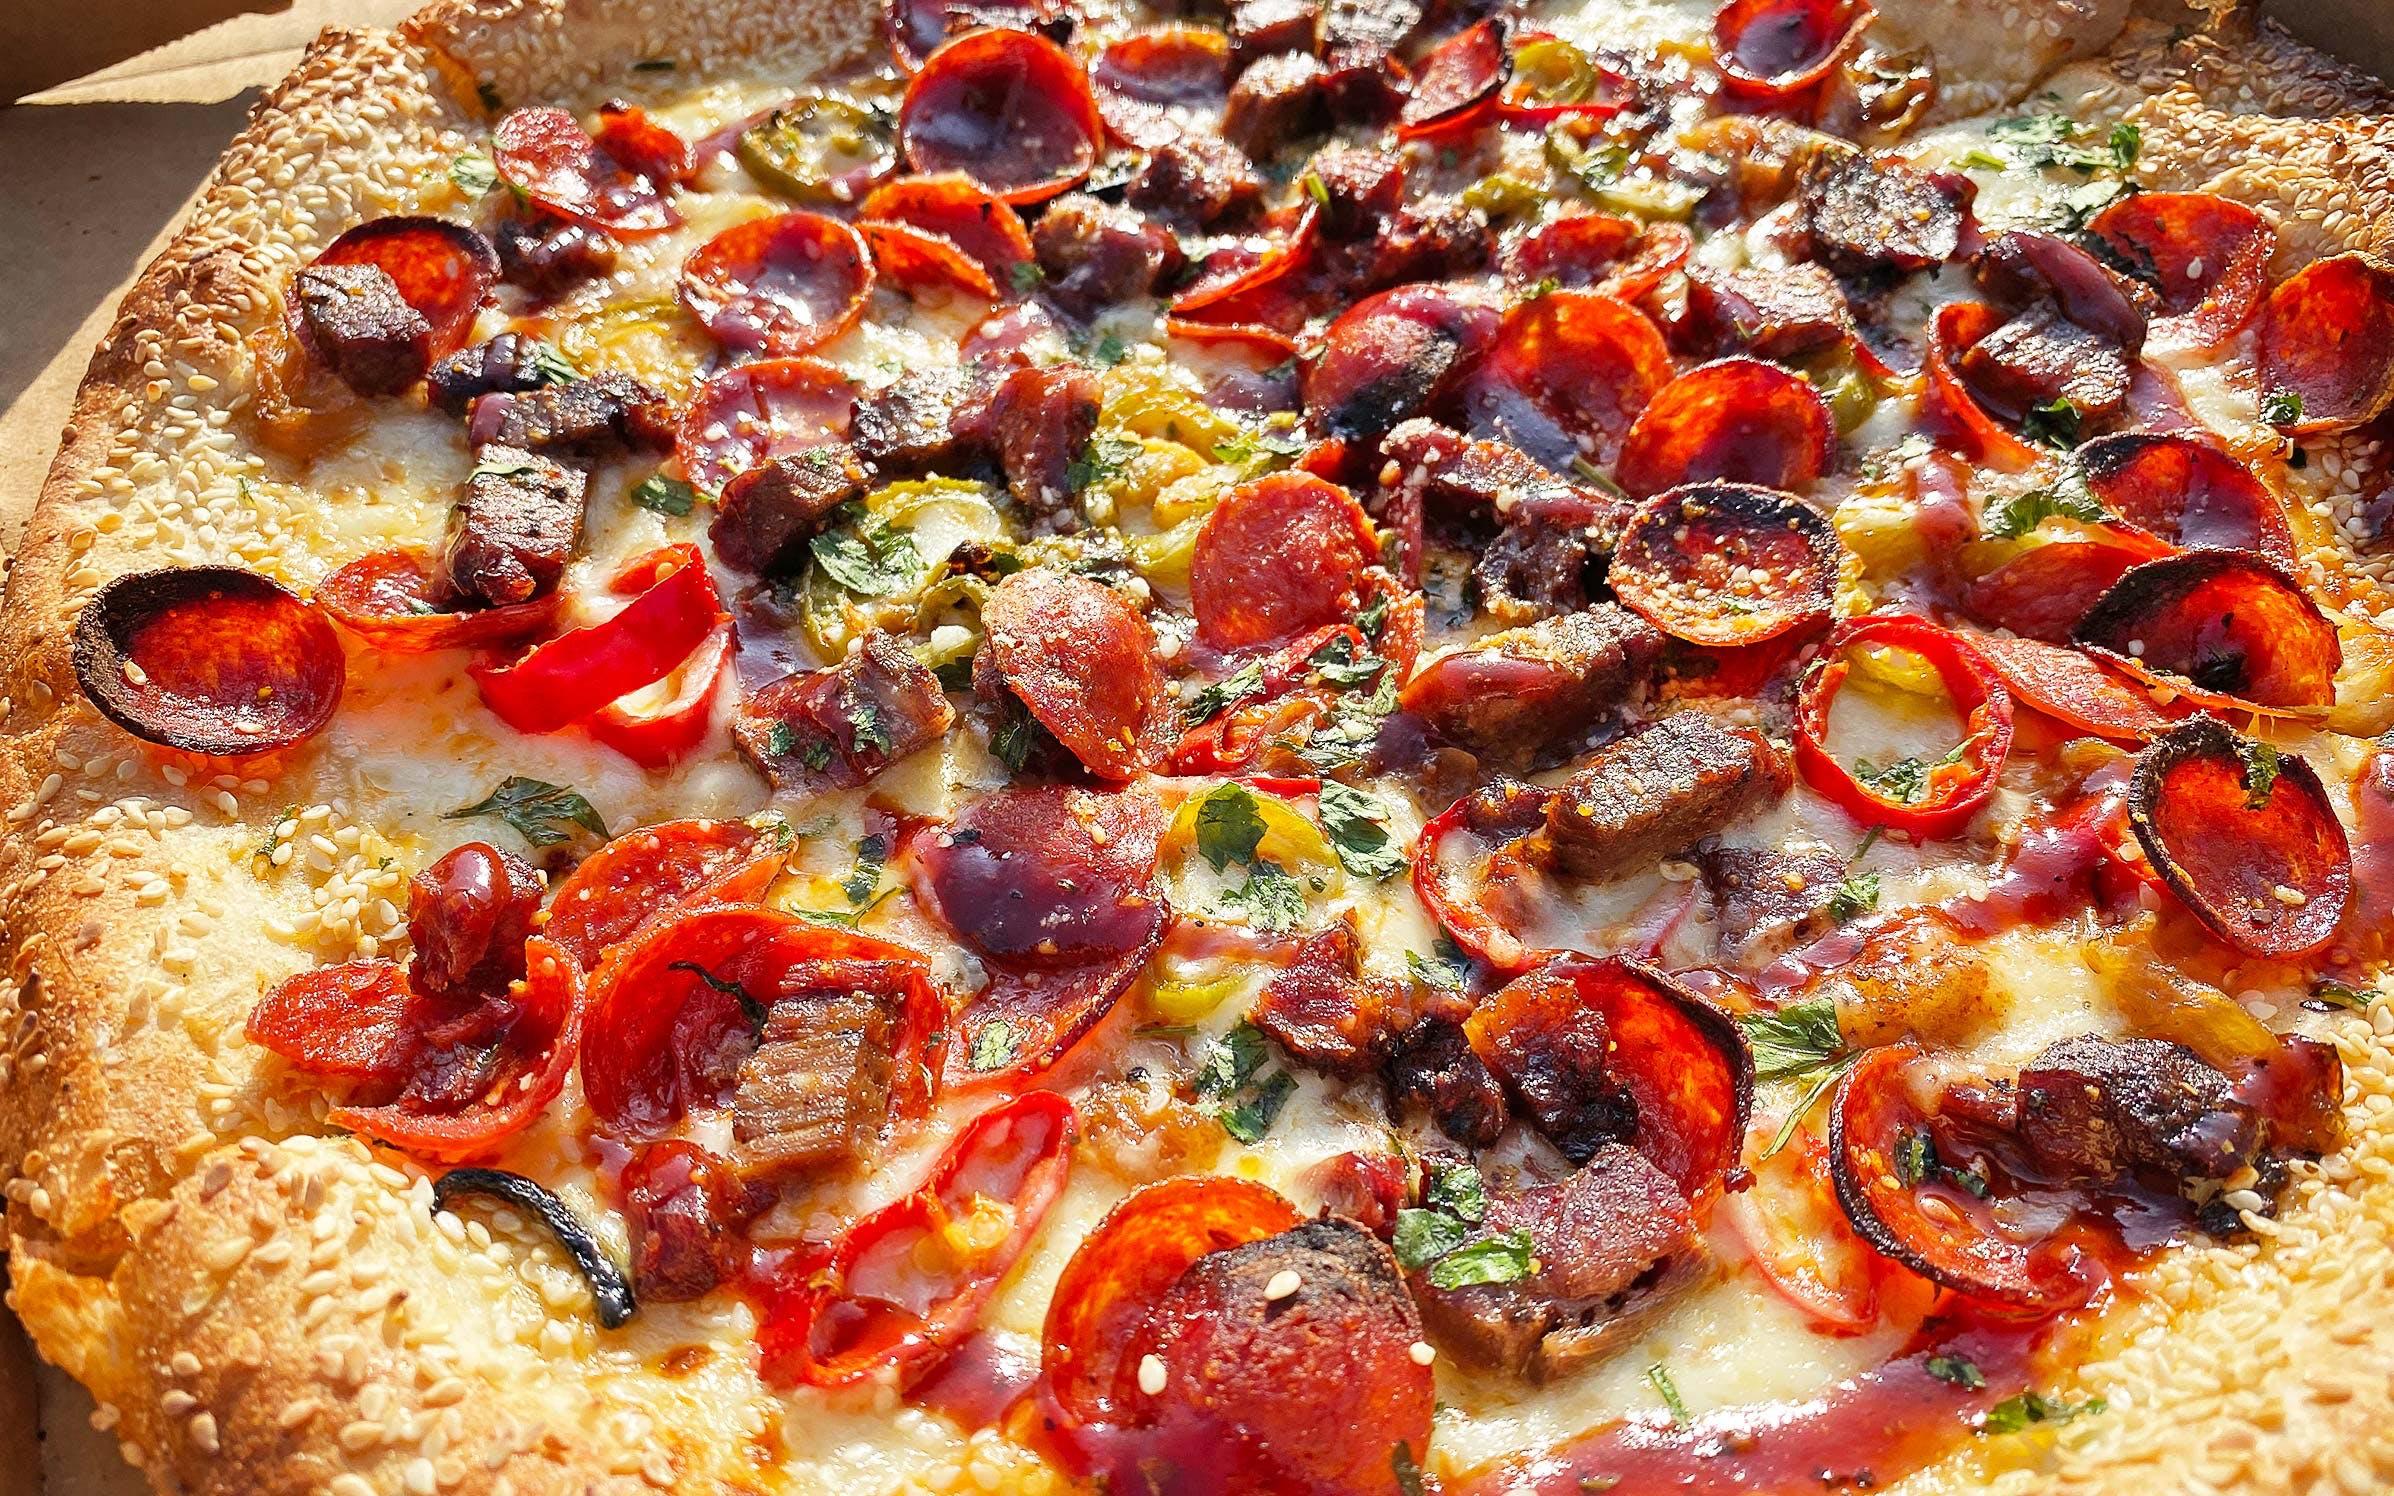 zolis brisket pizza